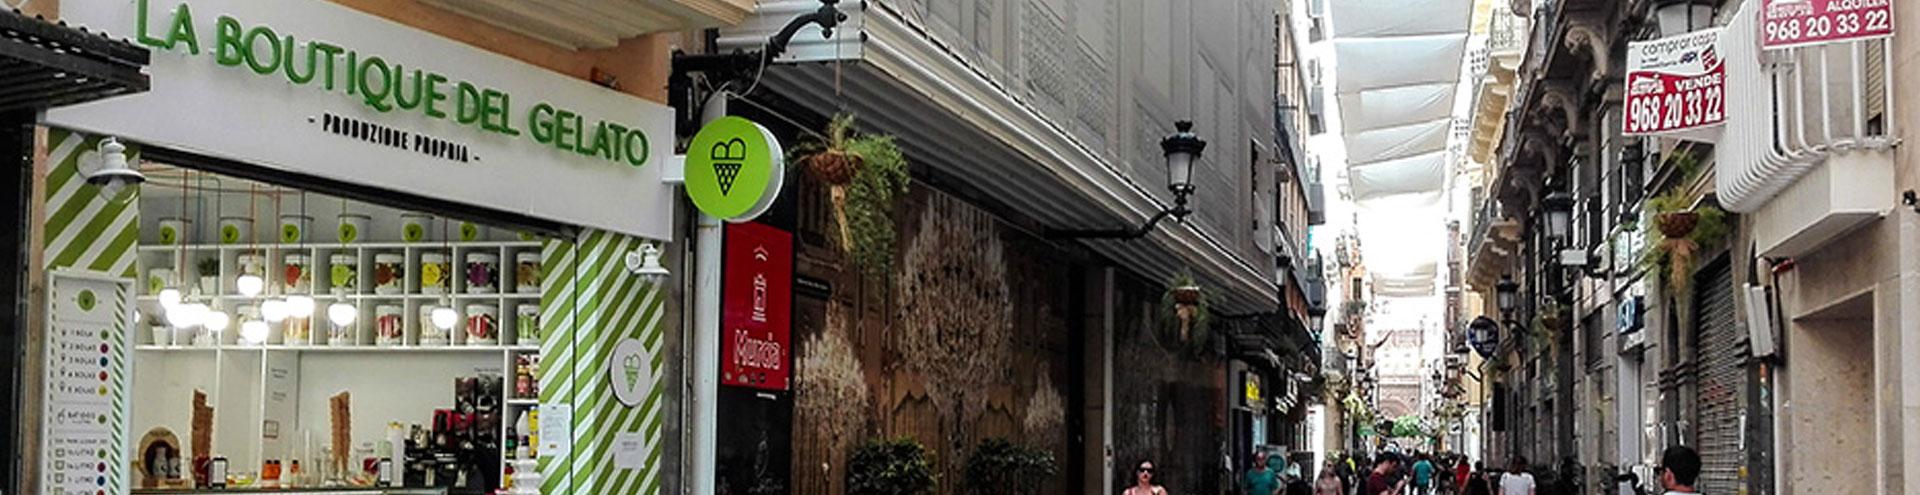 La Boutique del Gelato Murcia